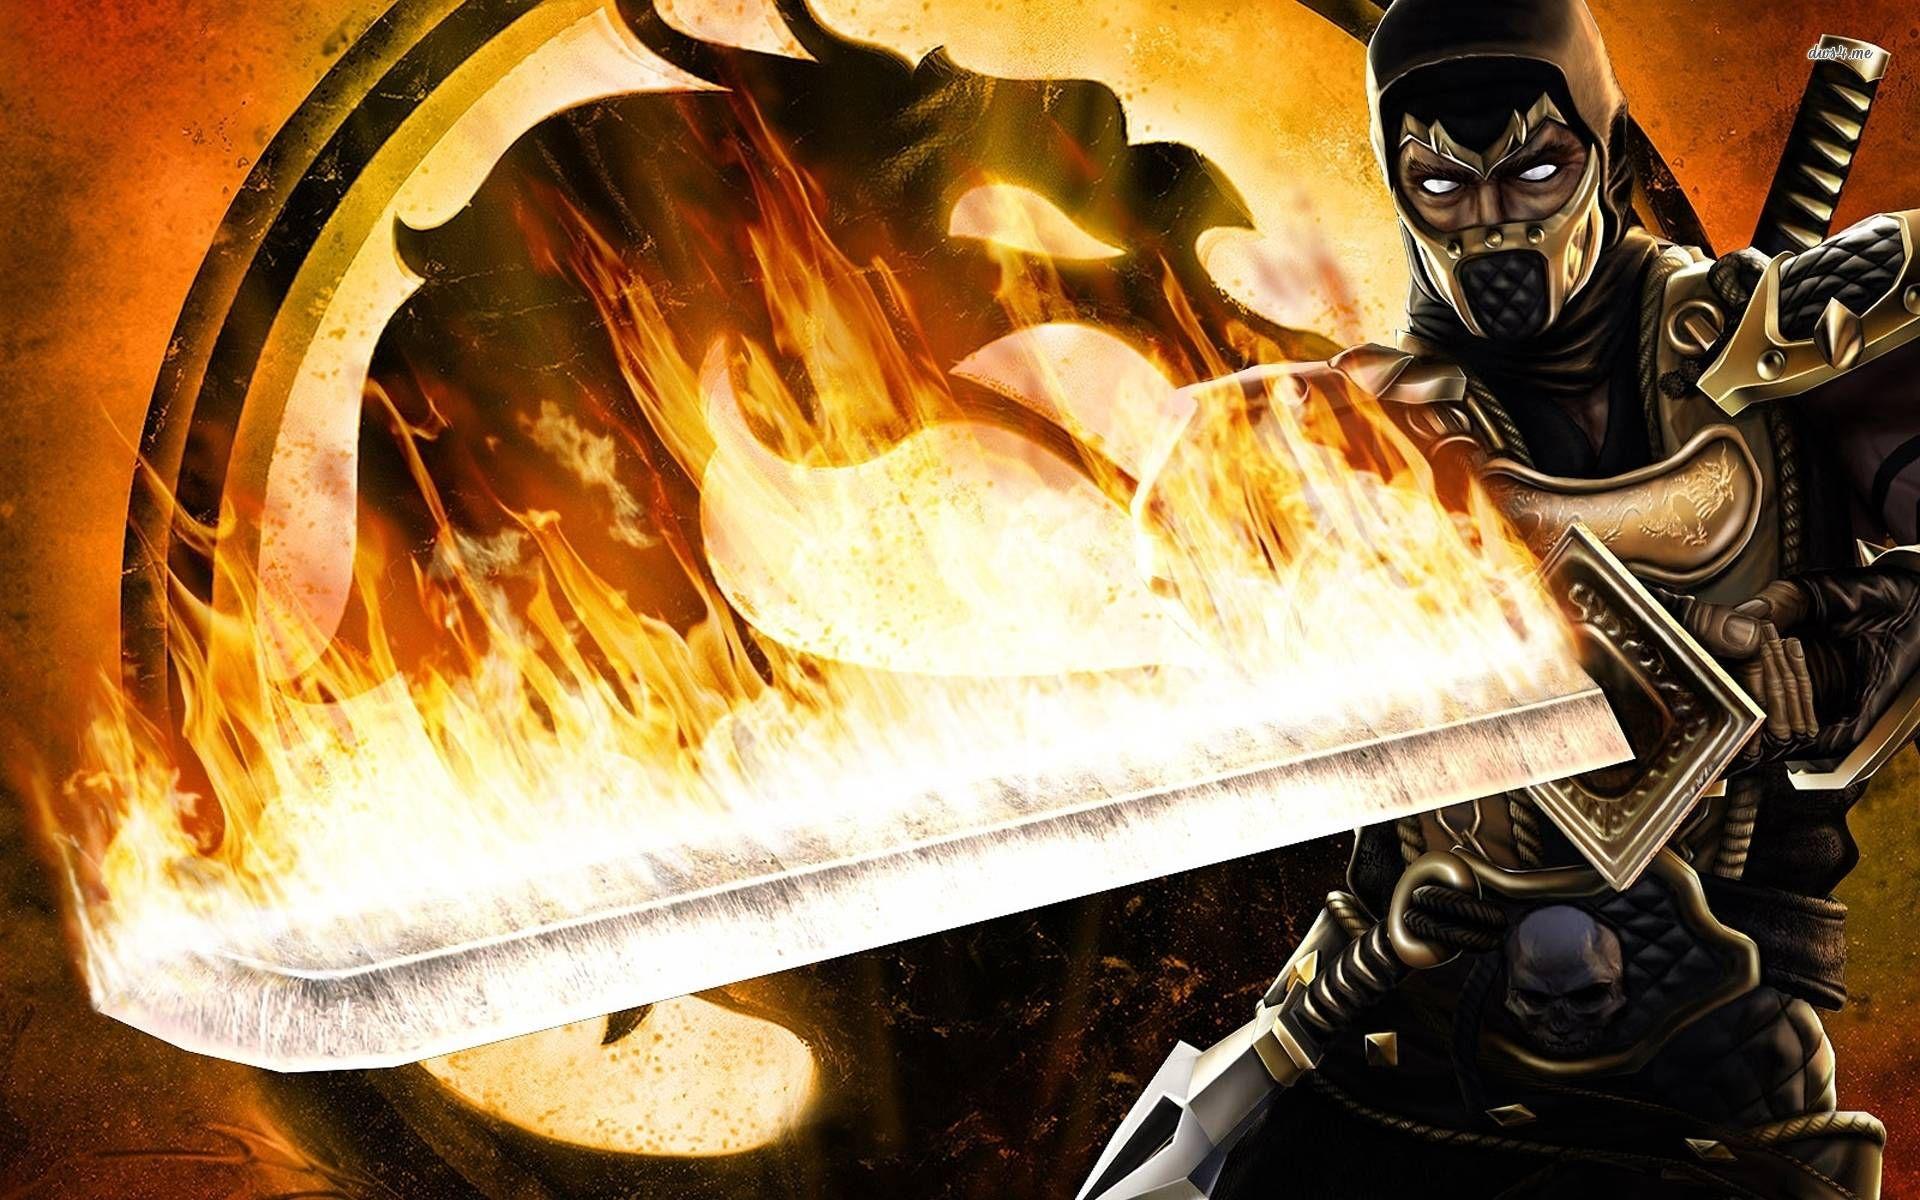 Mortal Kombat Scorpion Wallpaper Free 1px Mortal Kombat X Wallpapers Mortal Kombat Shaolin Monks Mortal Kombat X Scorpion